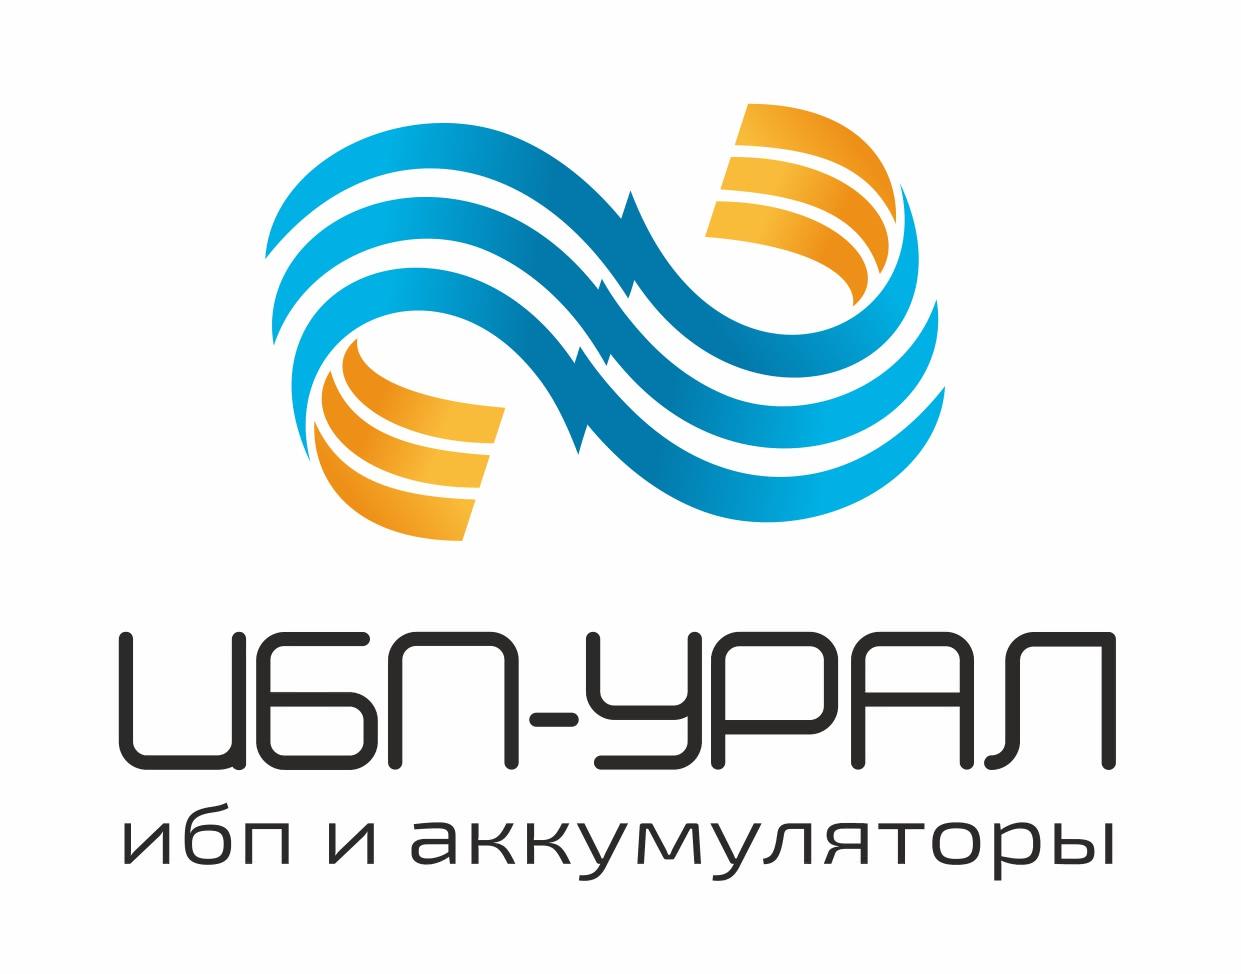 ibp logo 2 - Дилеры